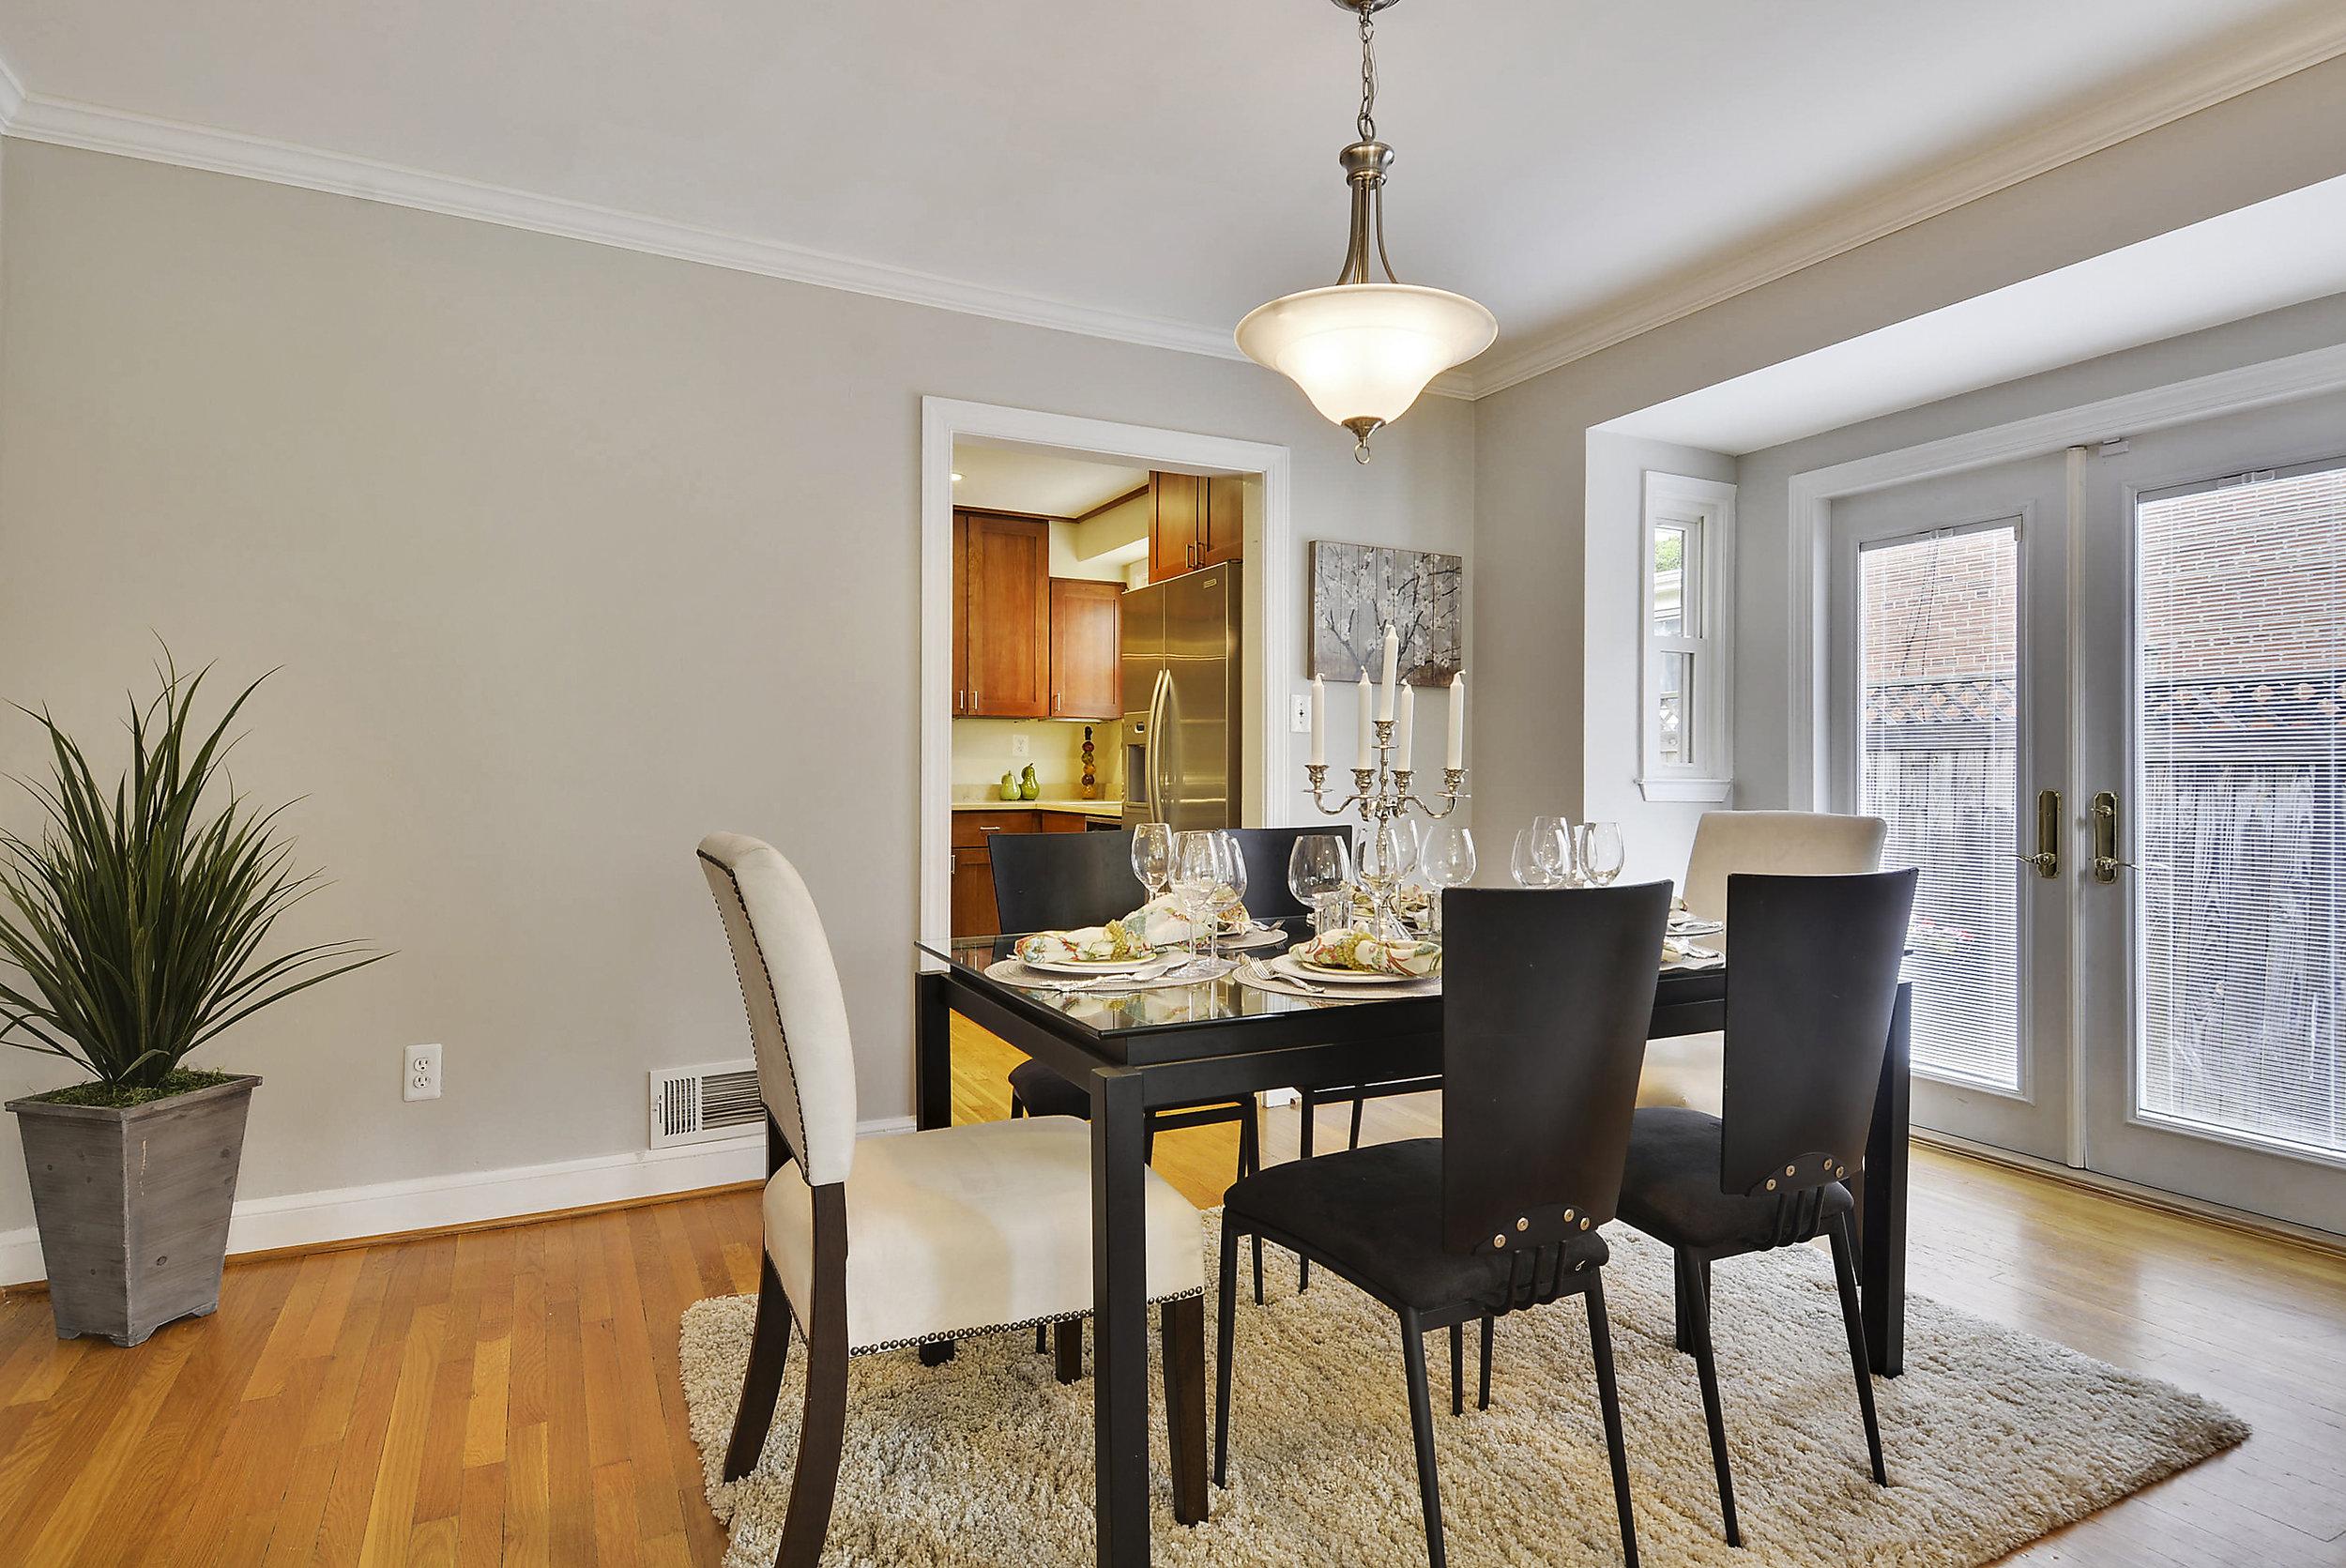 Main Level-Dining Room-_DSC5985.JPG